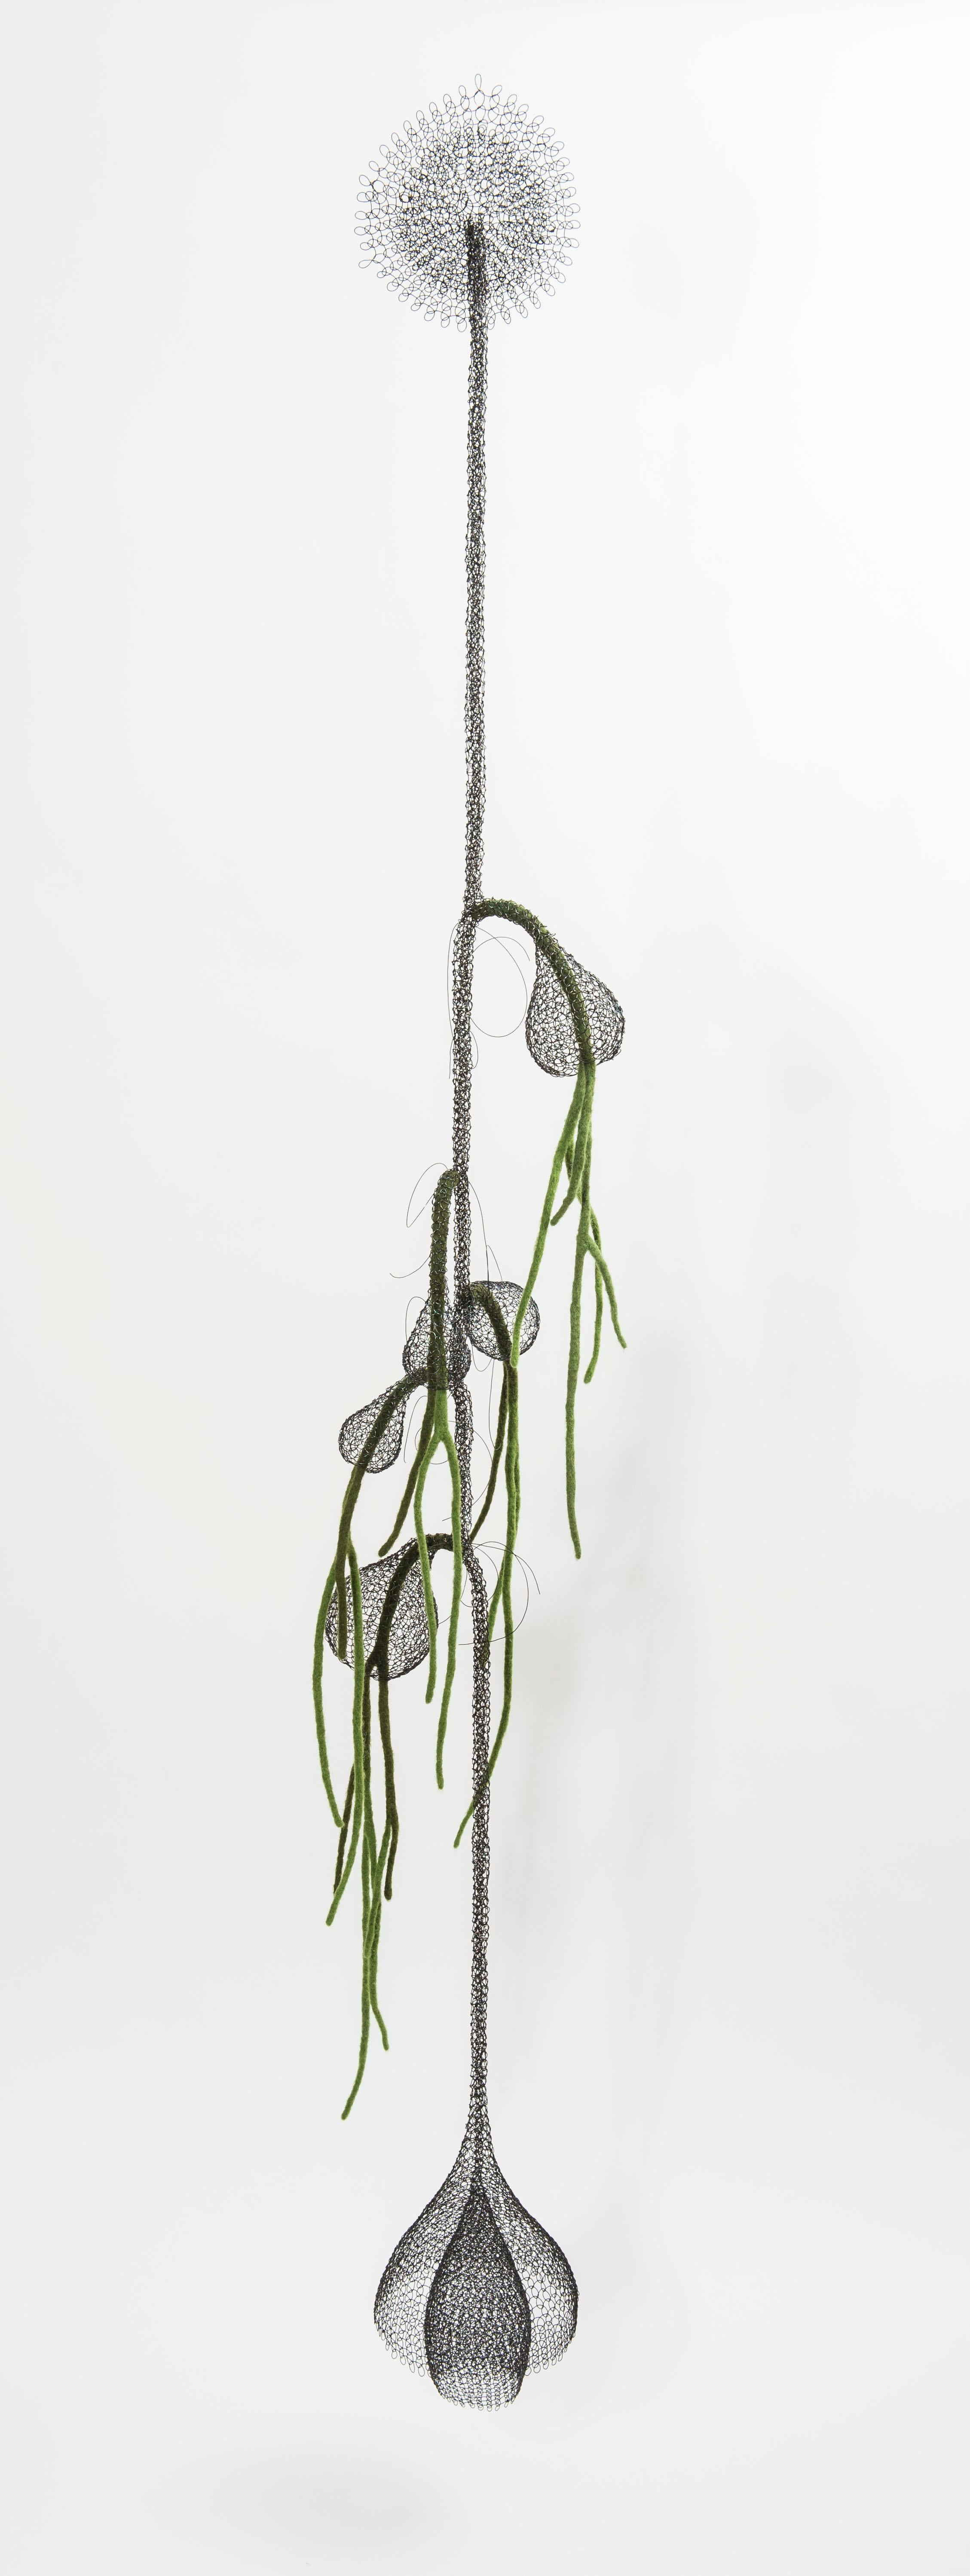 «Liane II», Handmade Metal Wire Mesh and Green Wool Pendant Mural Sculpture